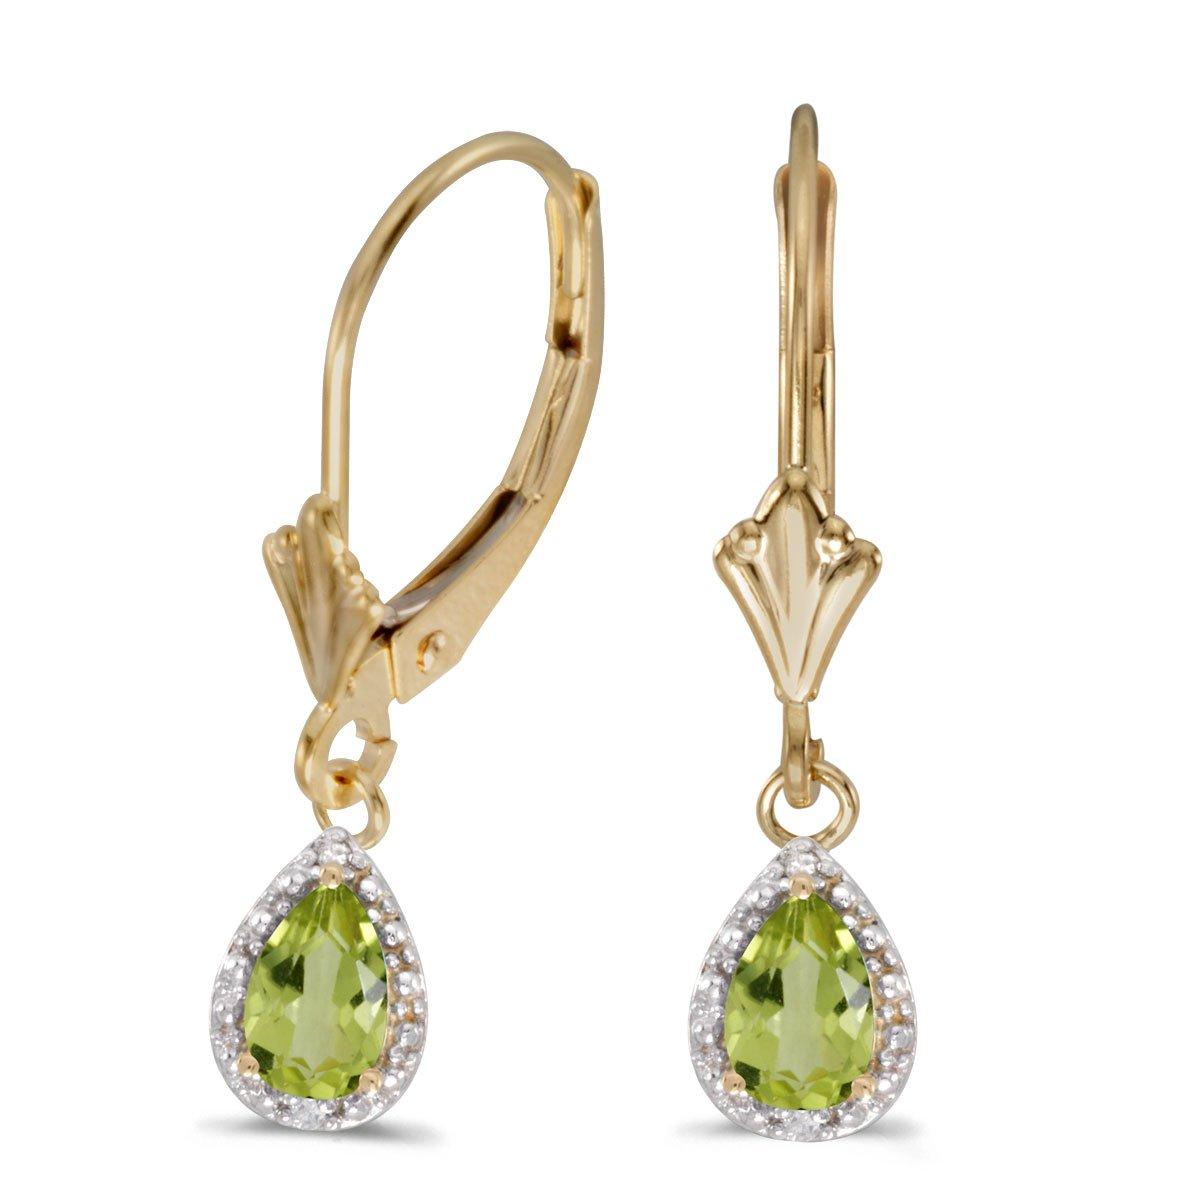 14k Yellow Gold Pear Peridot And Diamond Leverback Earrings